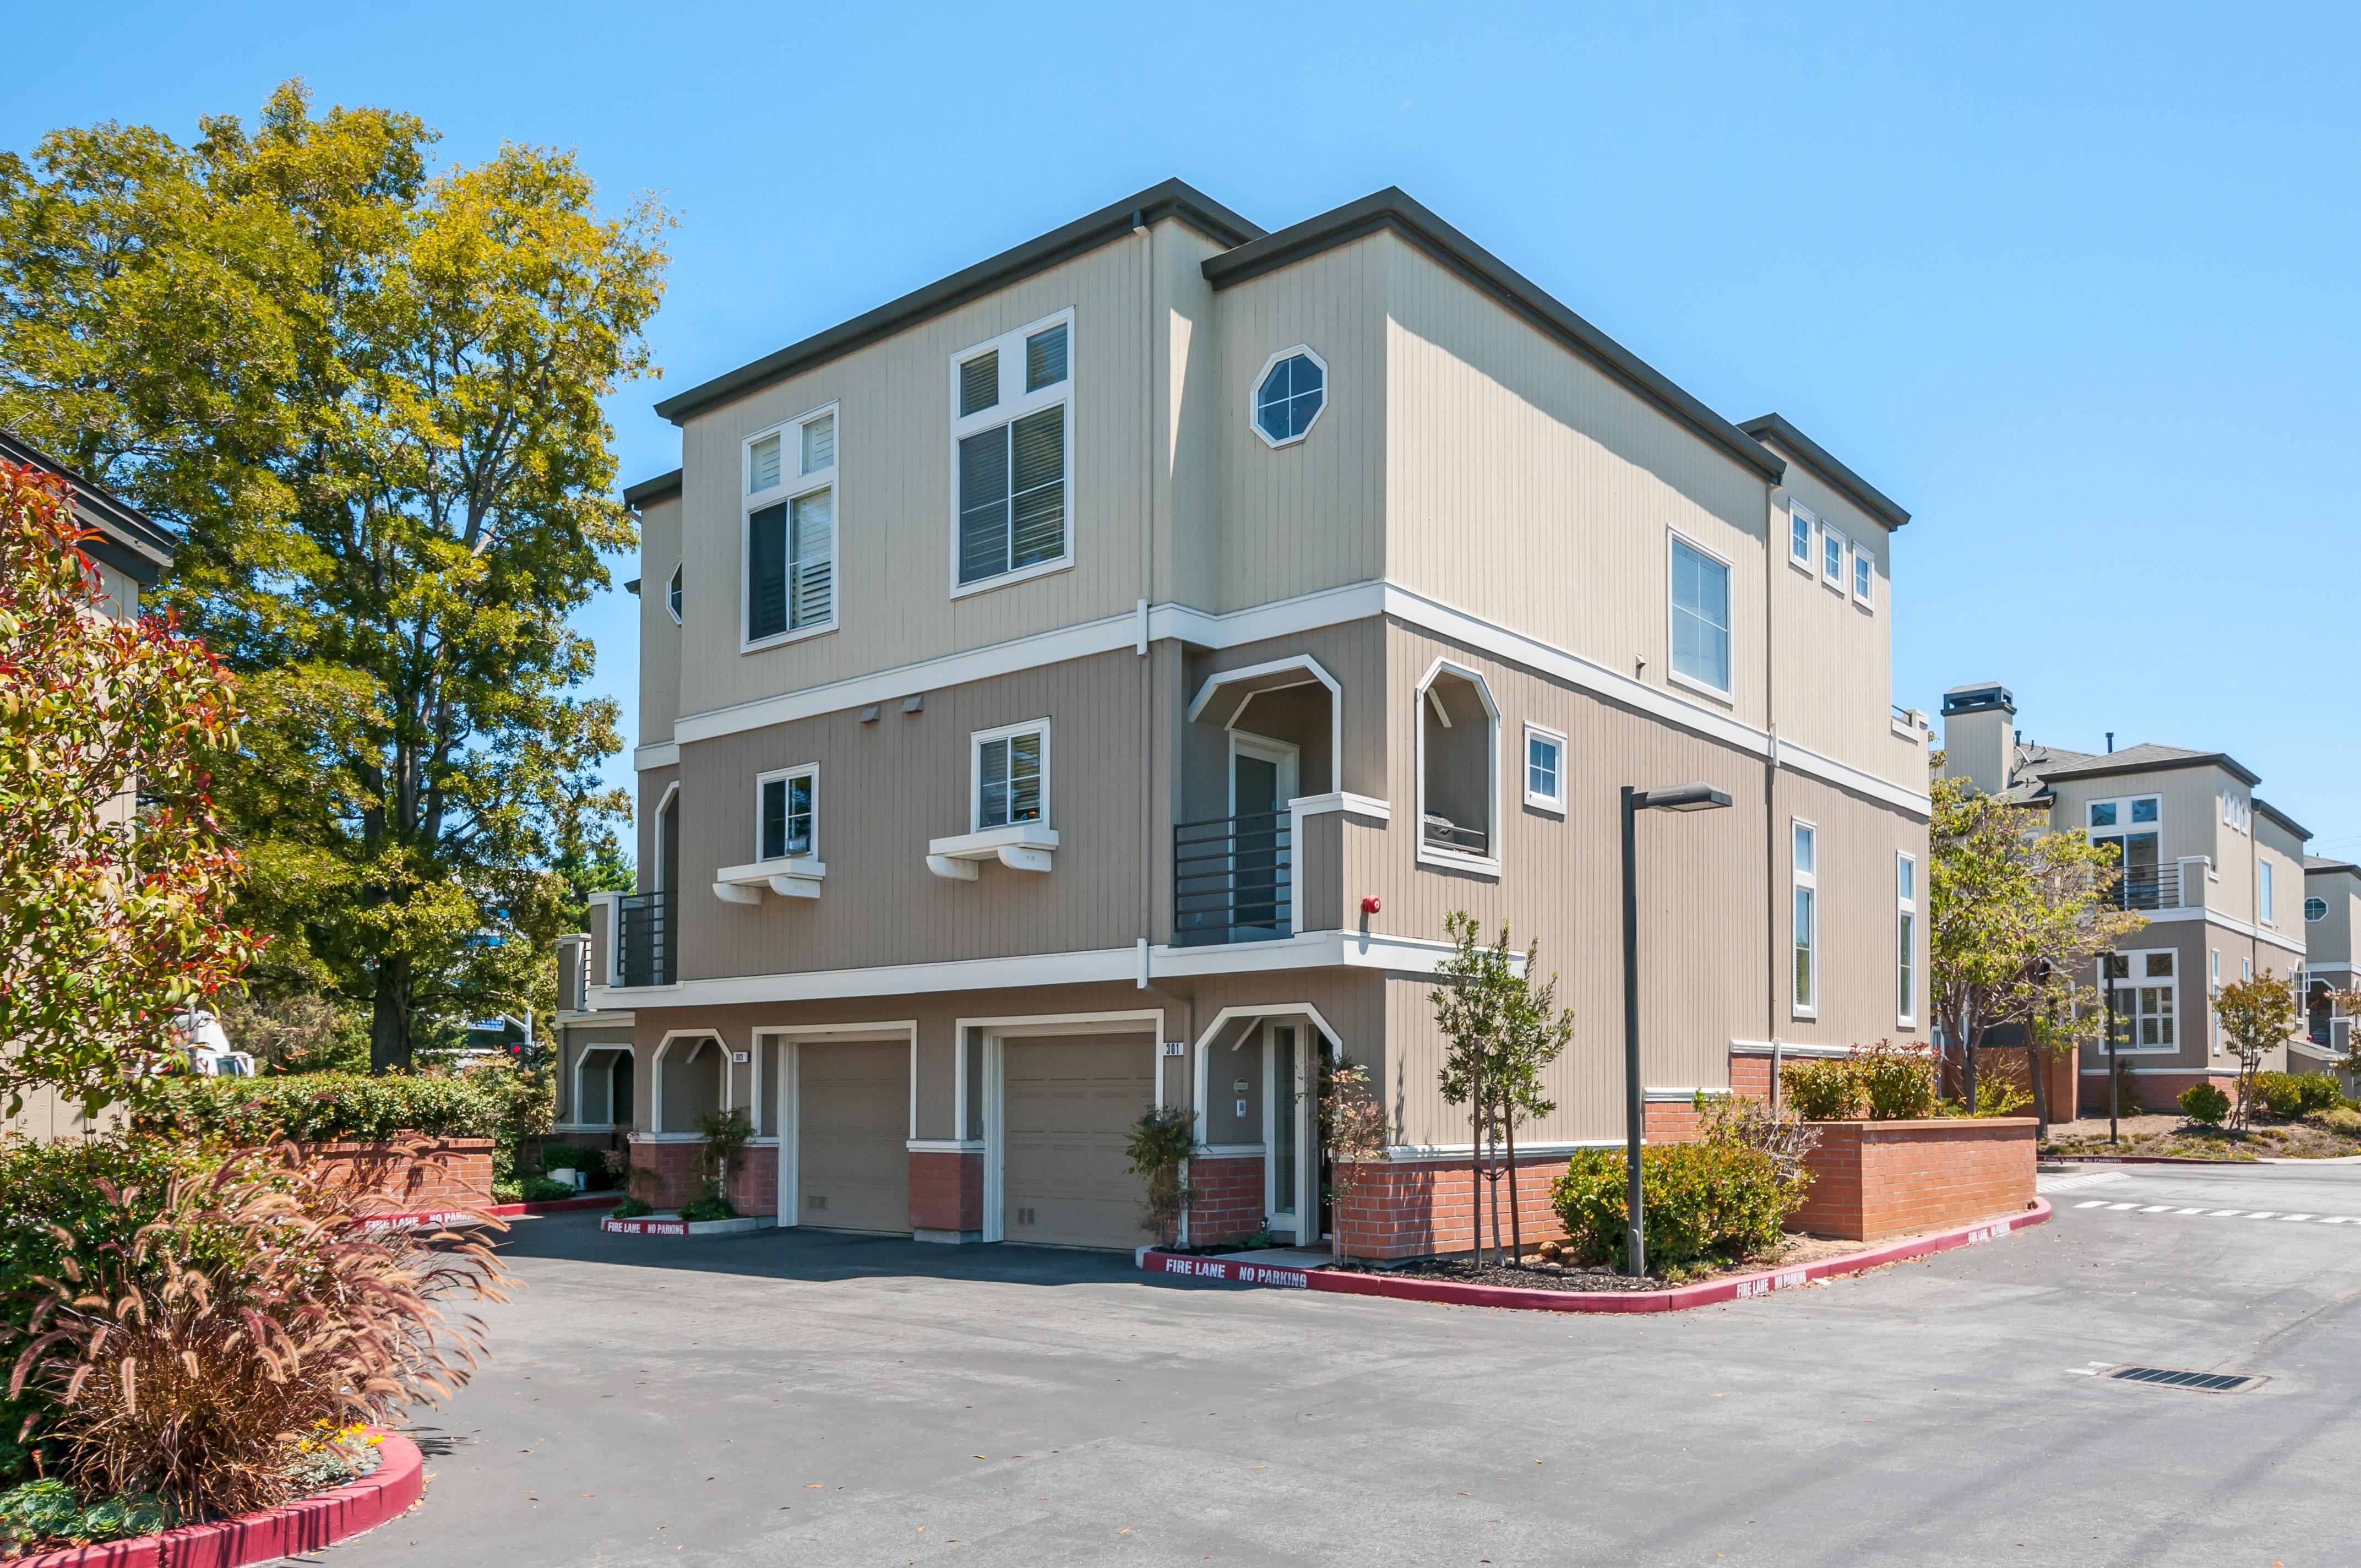 301 Emerald Bay Ln, Foster City, CA 94404